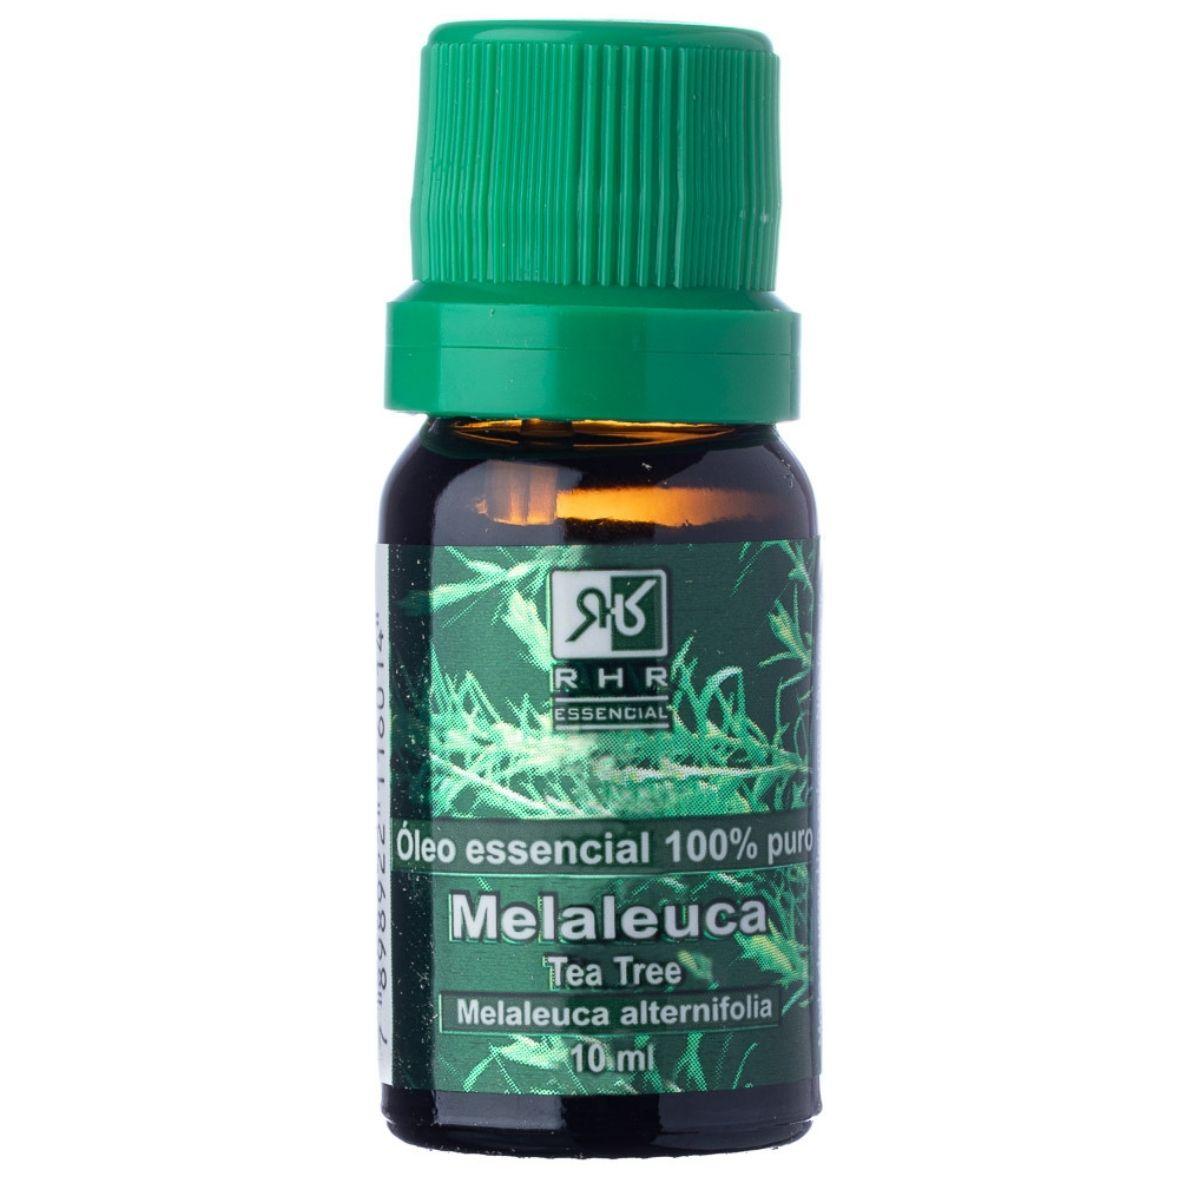 Oleo Essencial Melaleuca Puro Tea Tree 10ml - 100% Puro e Natural